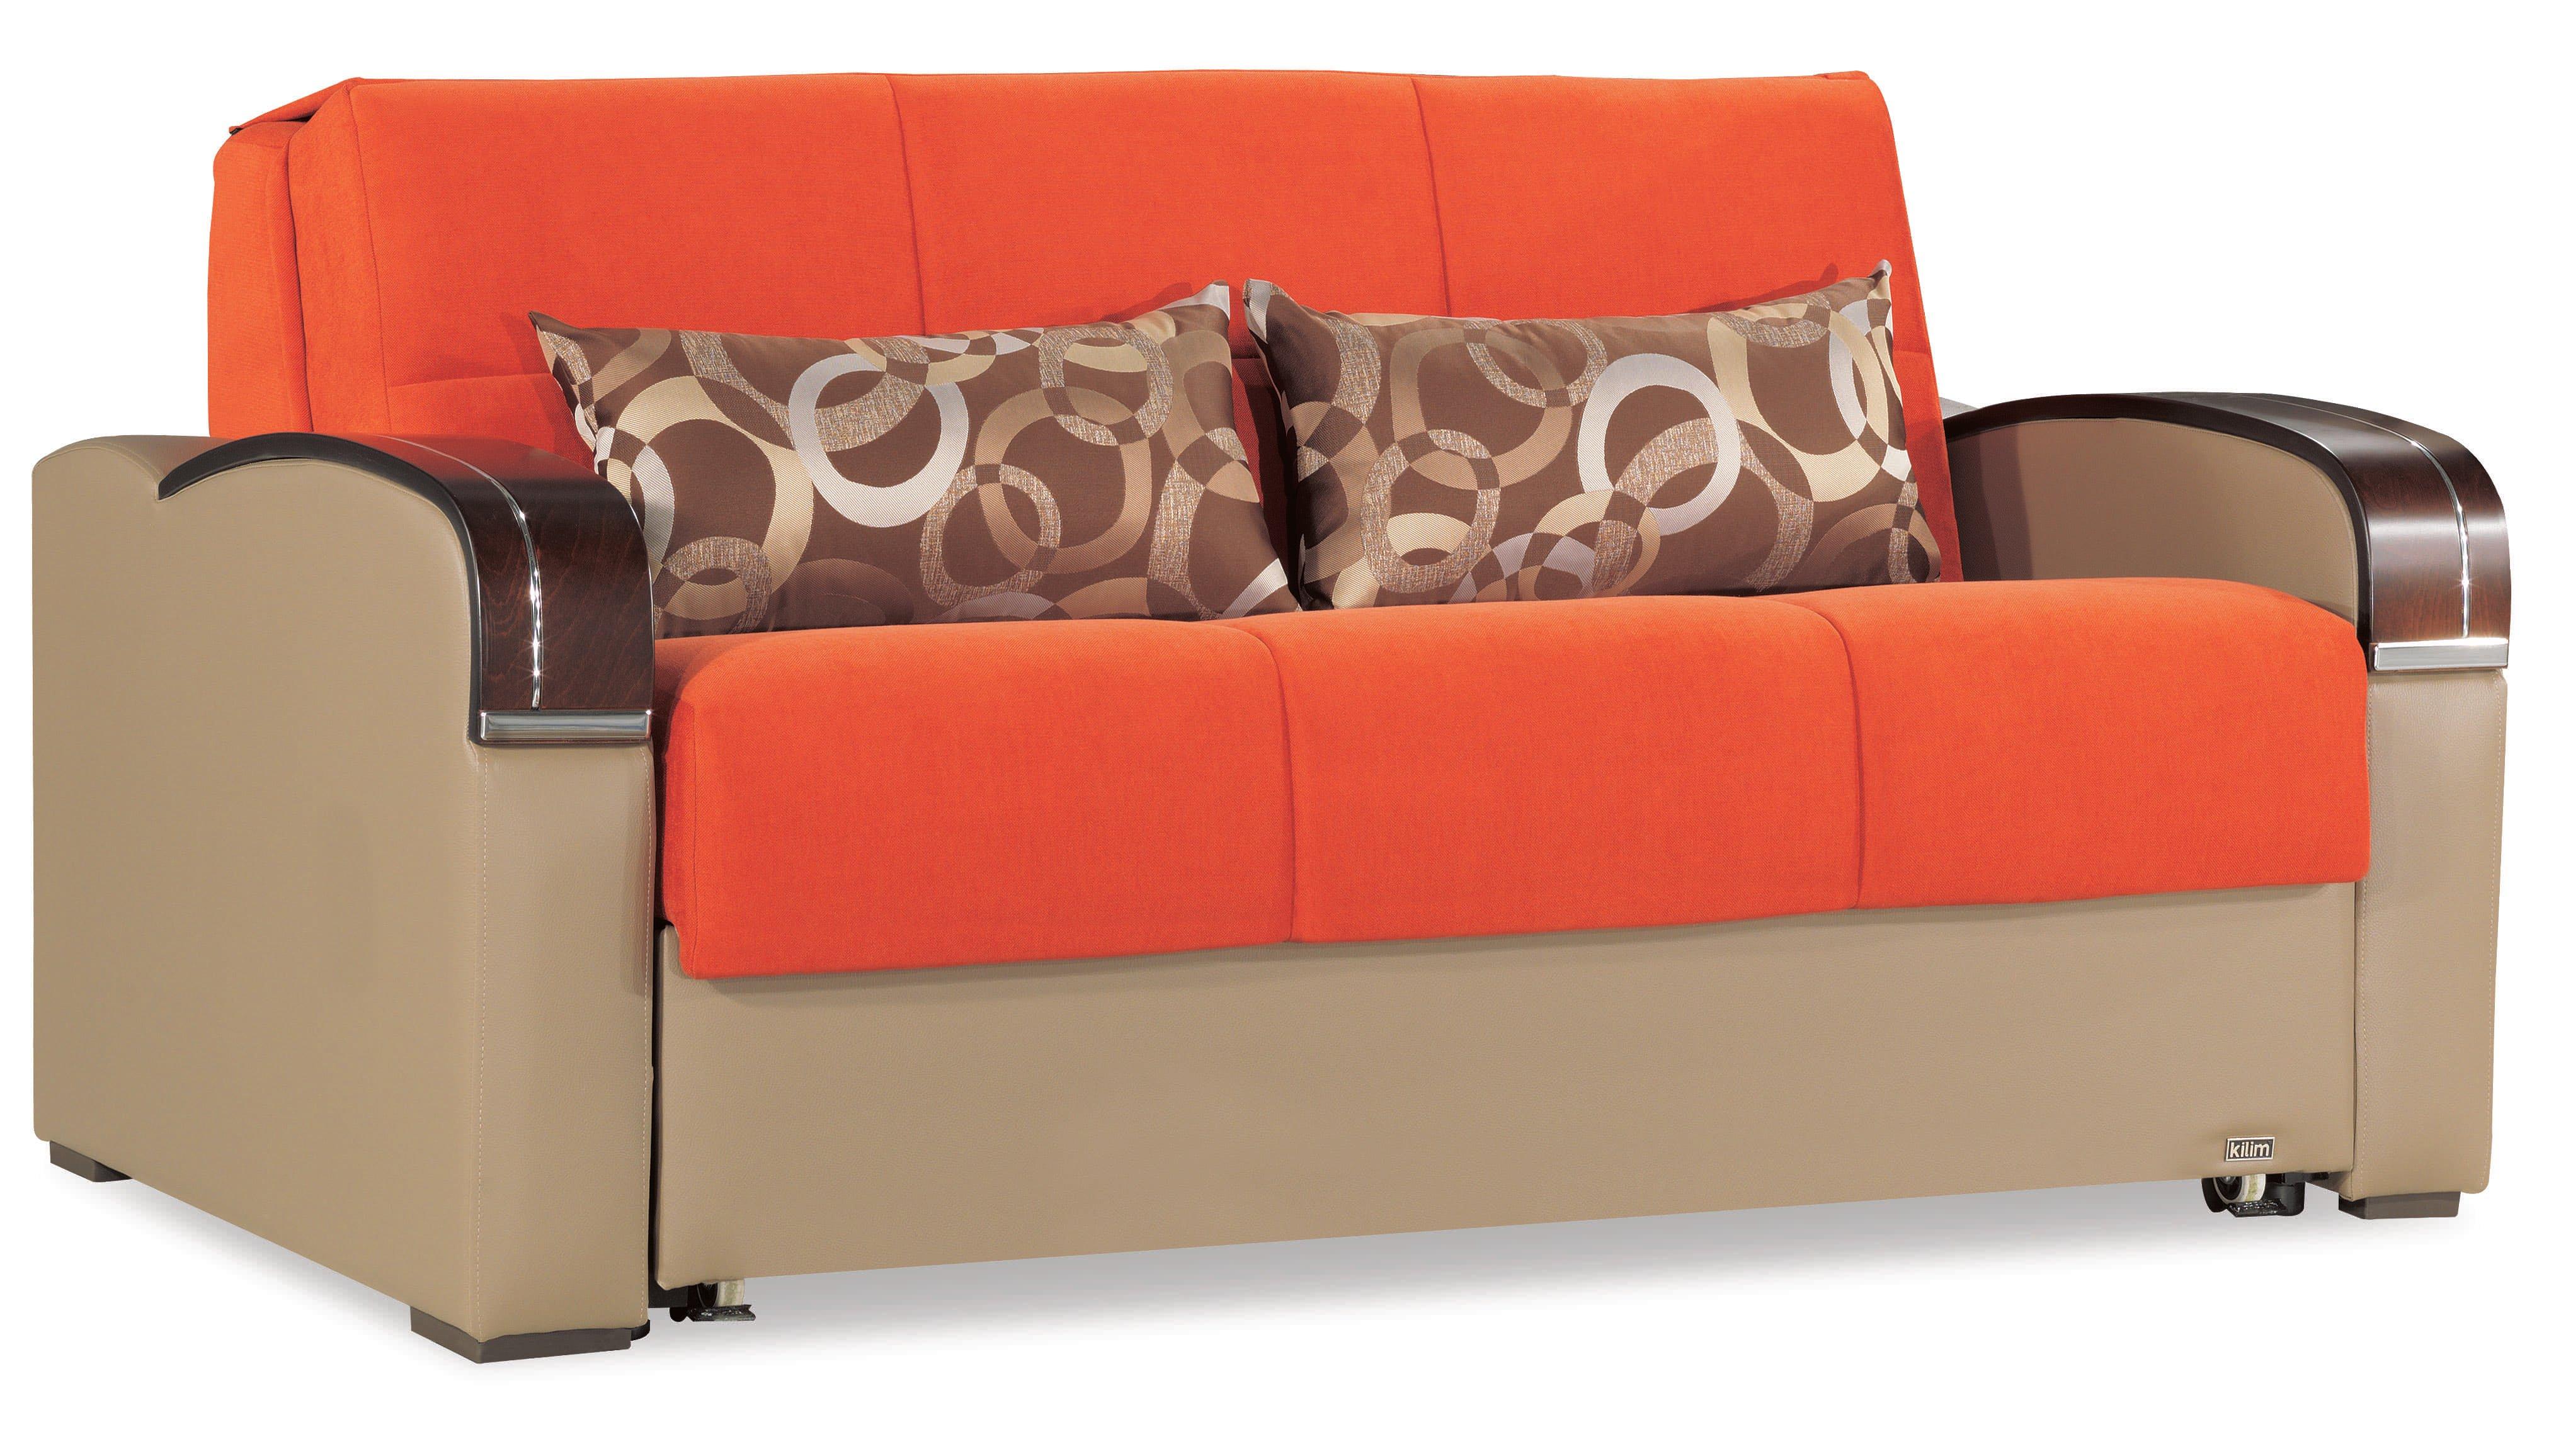 Sleep Plus Orange Loveseat Full Sleeper by Casamode